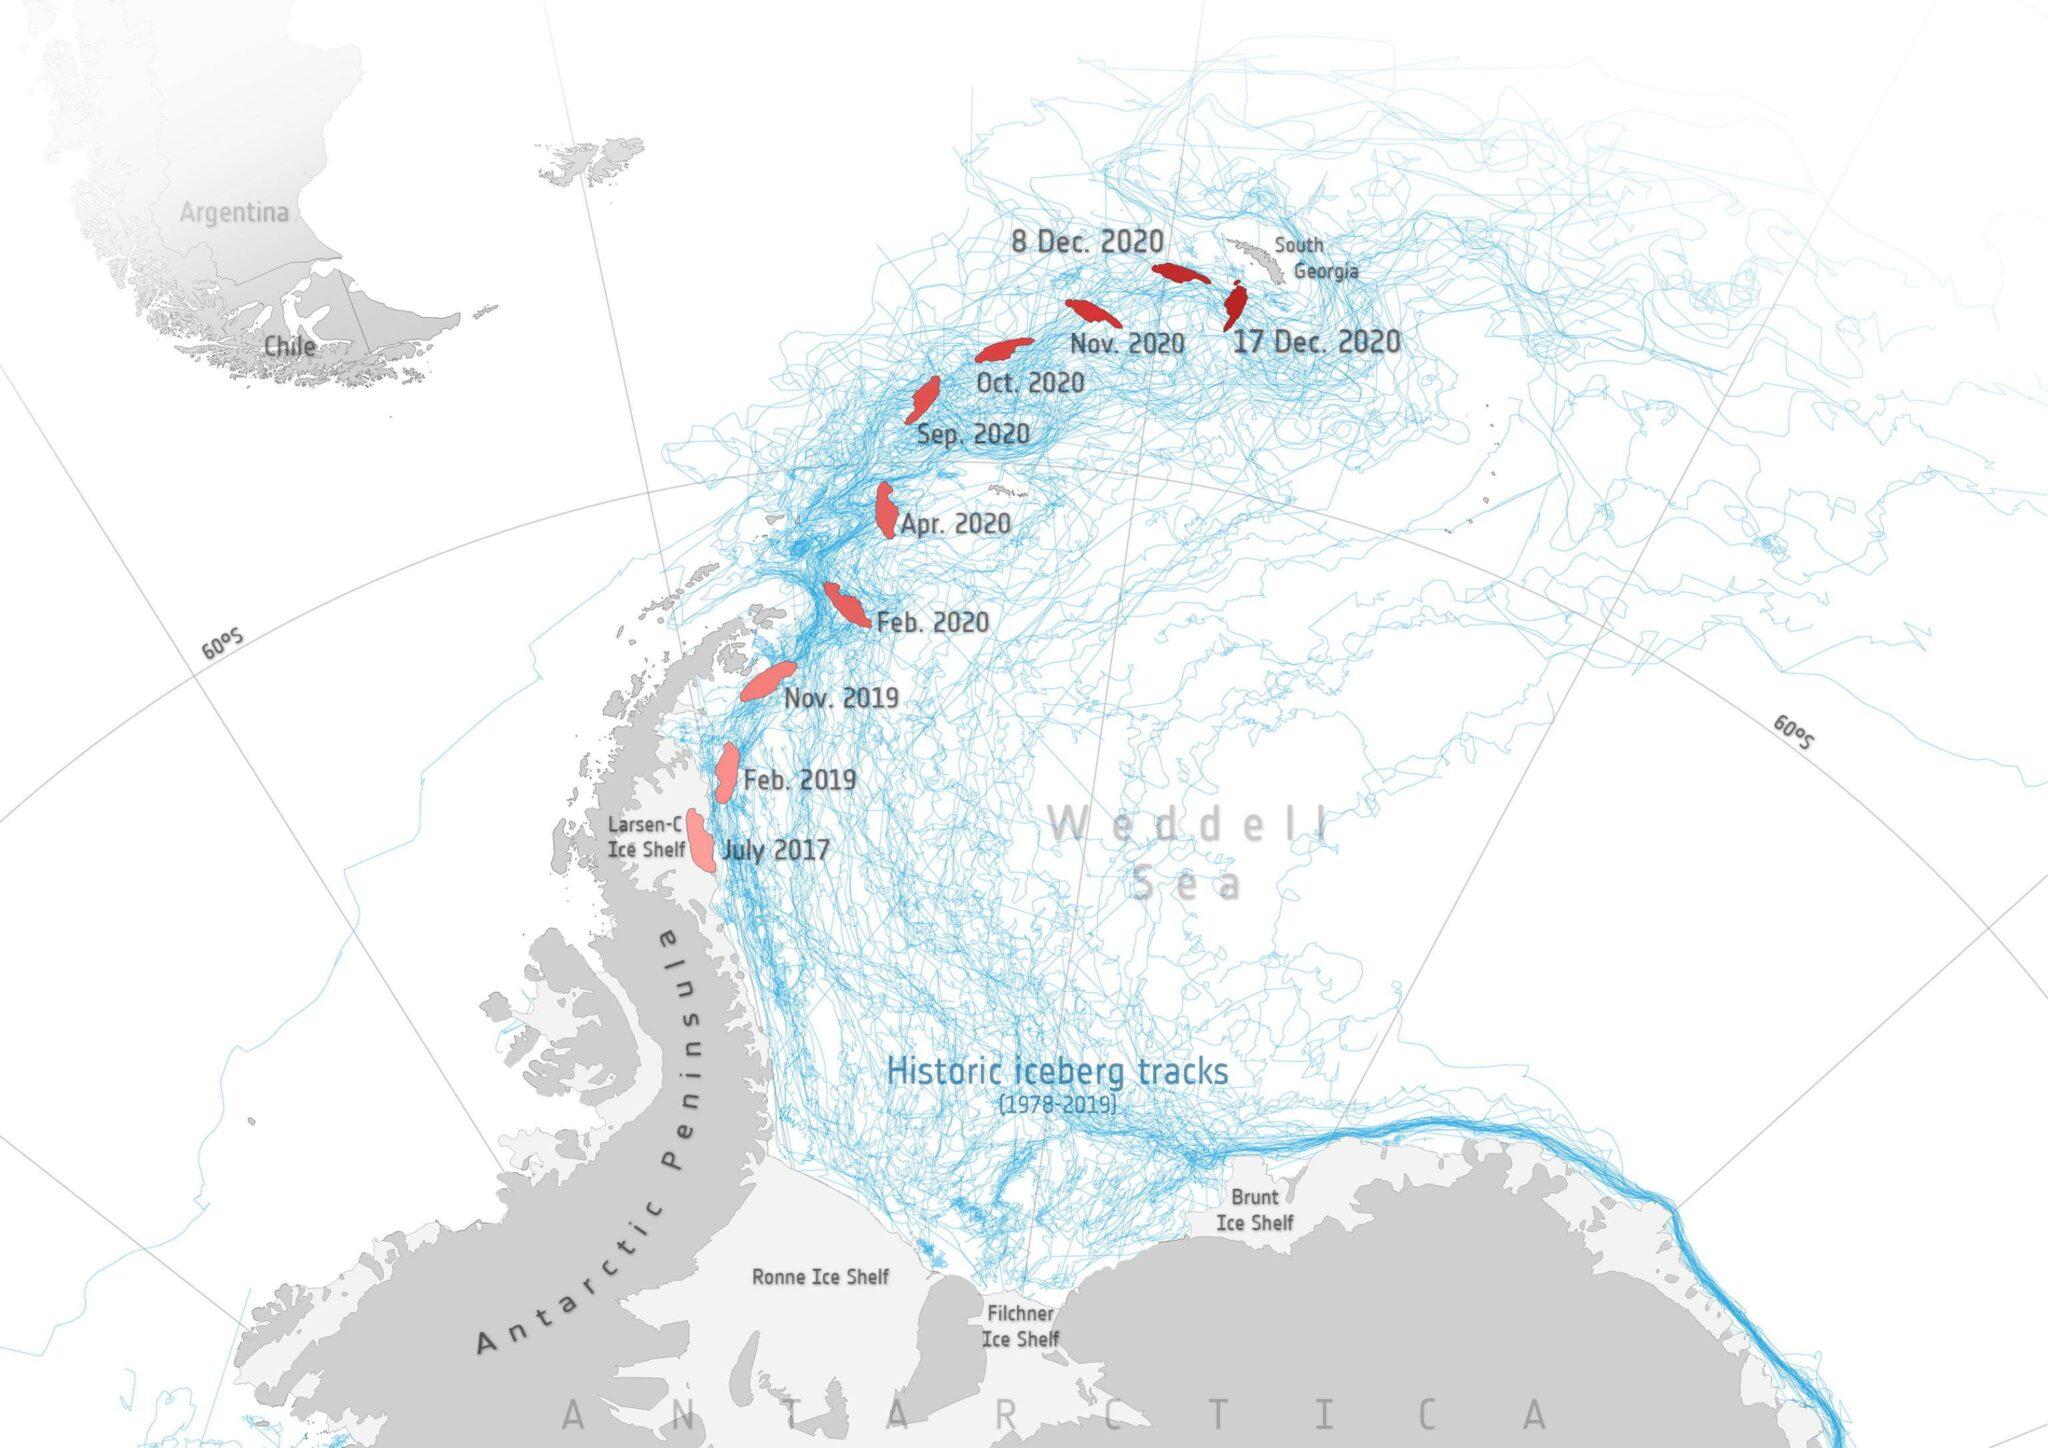 ghiacciai, A-68, parigi, iceberg, clima, riscaldamento, nasa, ecosistema, accordo, albedo, acqua, target, iea, Energy Close-up Engineering